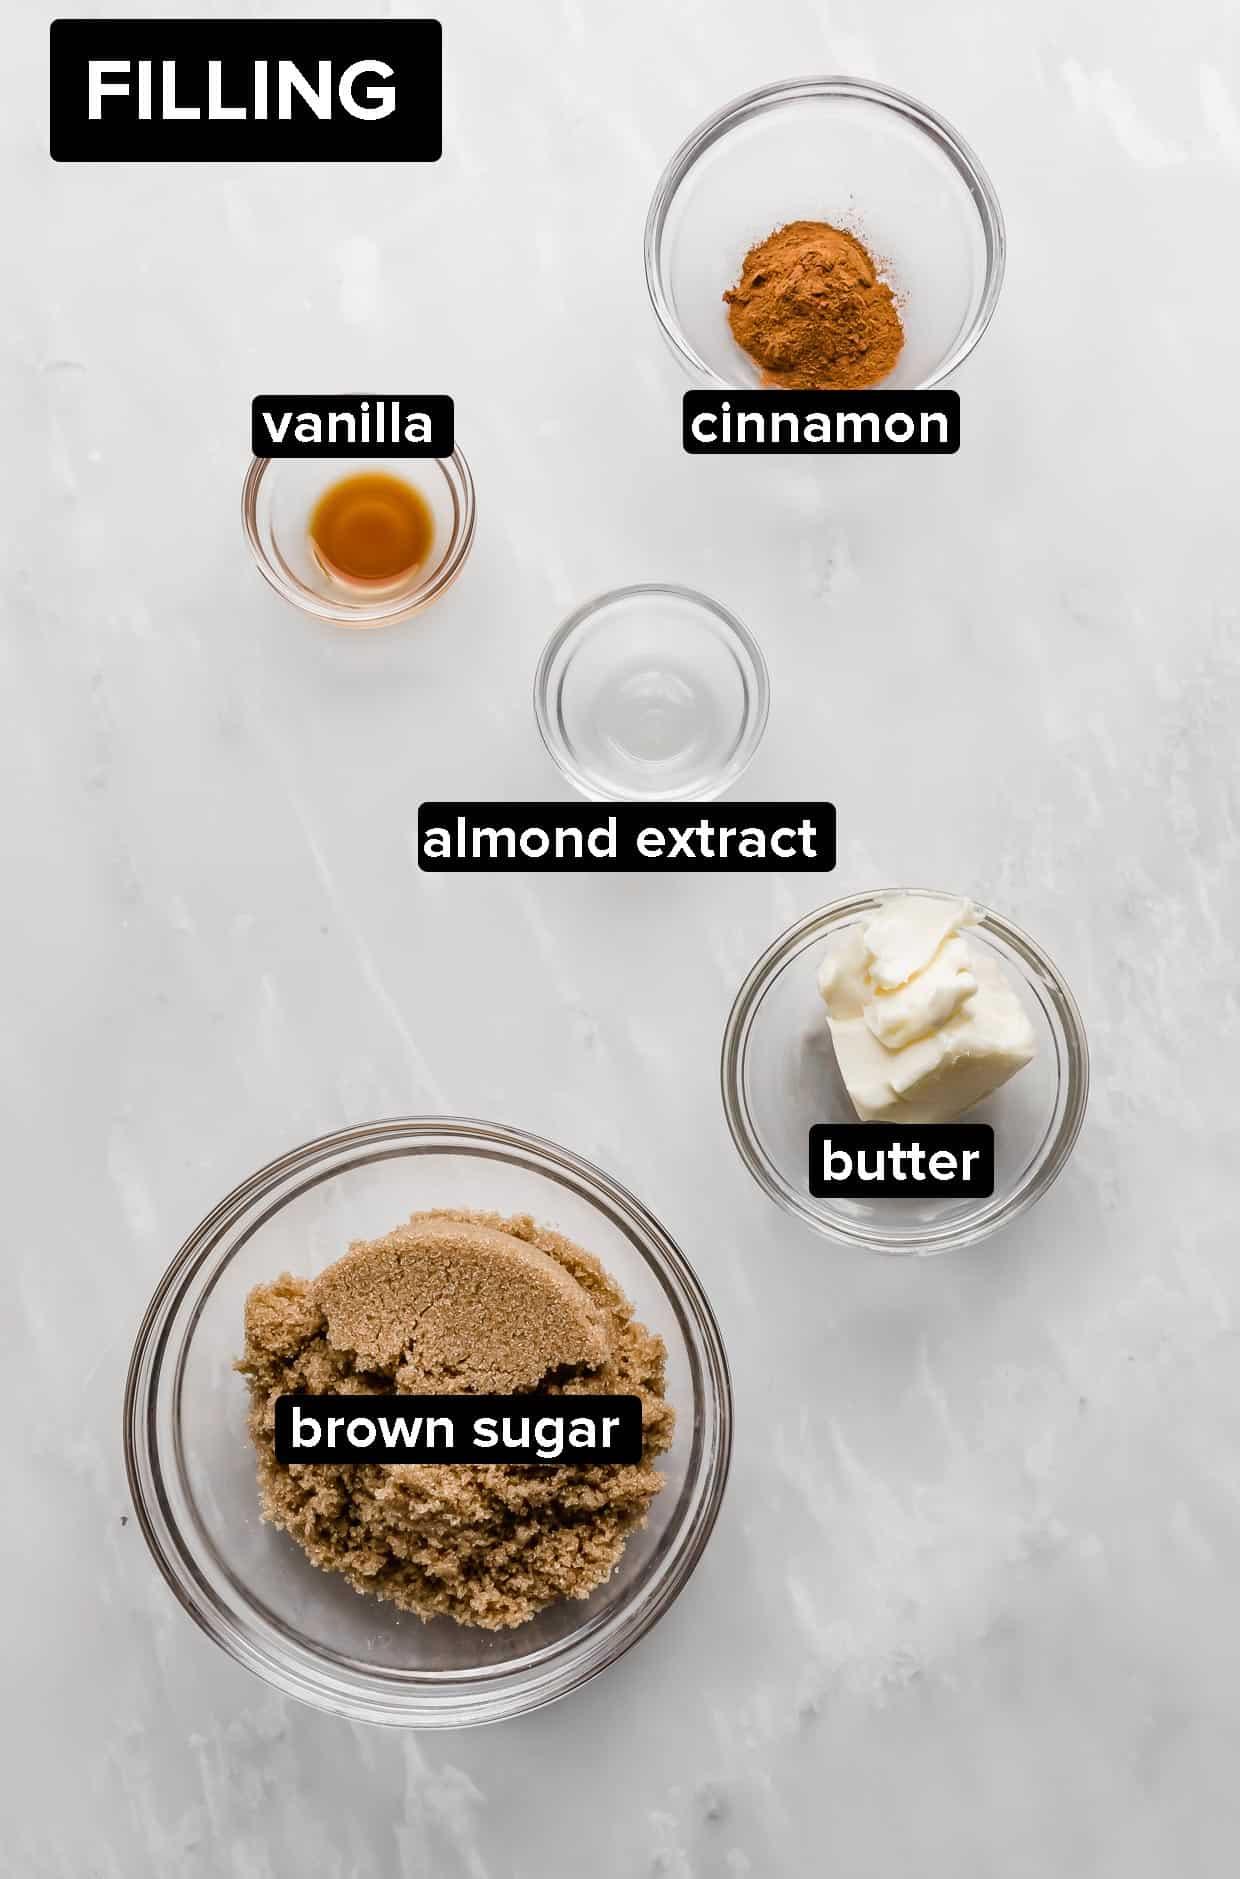 Ingredients used to make the cinnamon sugar filling for cinnamon rolls.